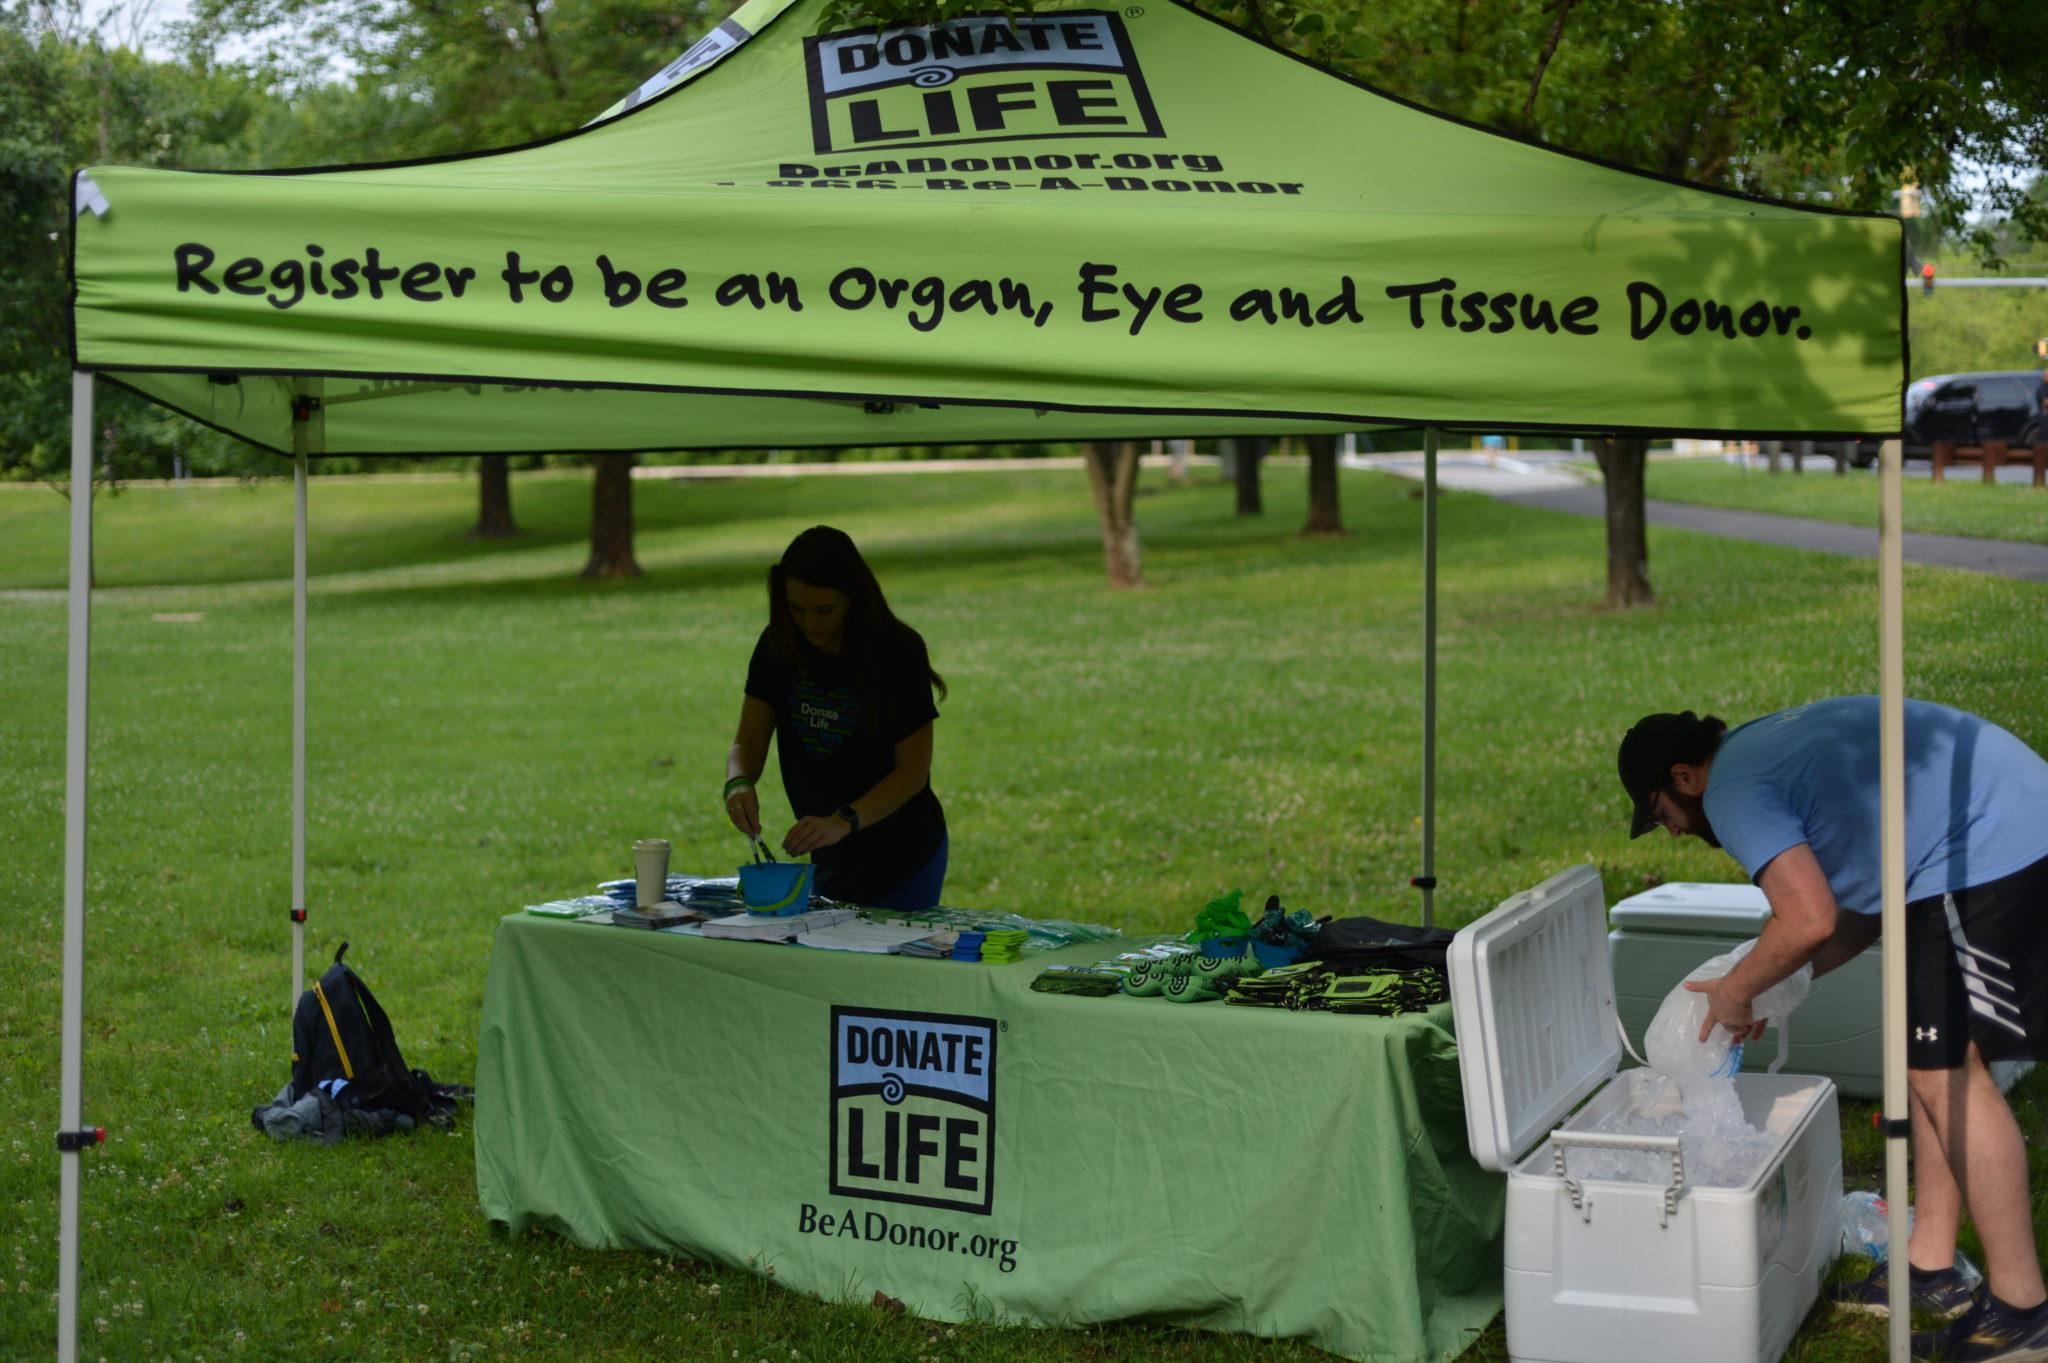 Donate Life Tent at Finish